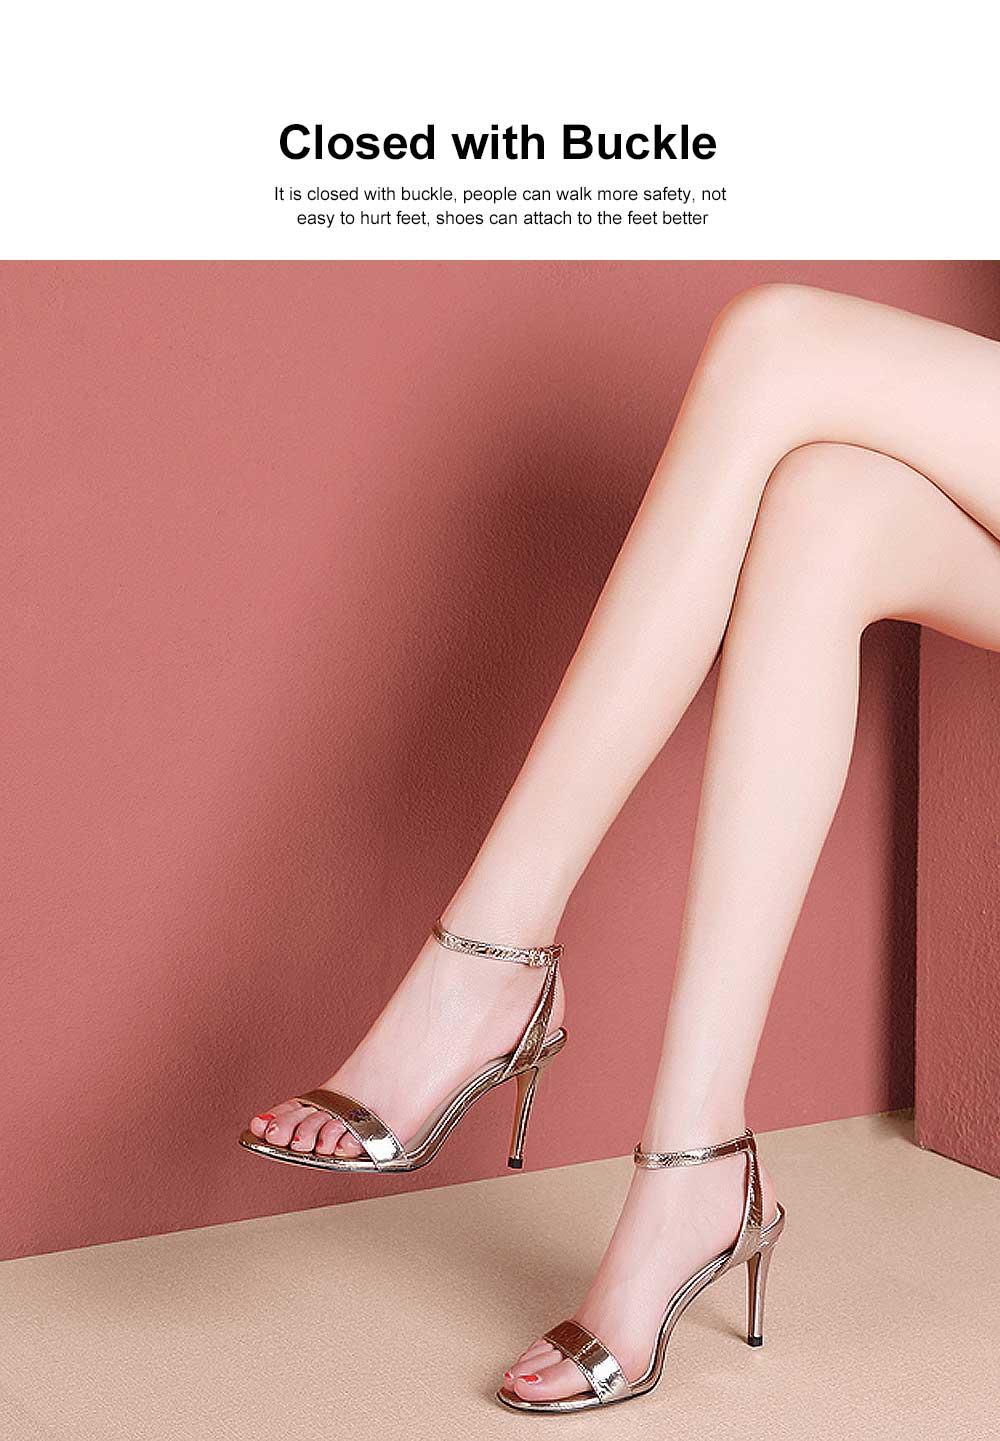 Summer High Heel Sandals with Word Buckle Roman Sandals, Women Dress Shoes Sexy High Heels 1